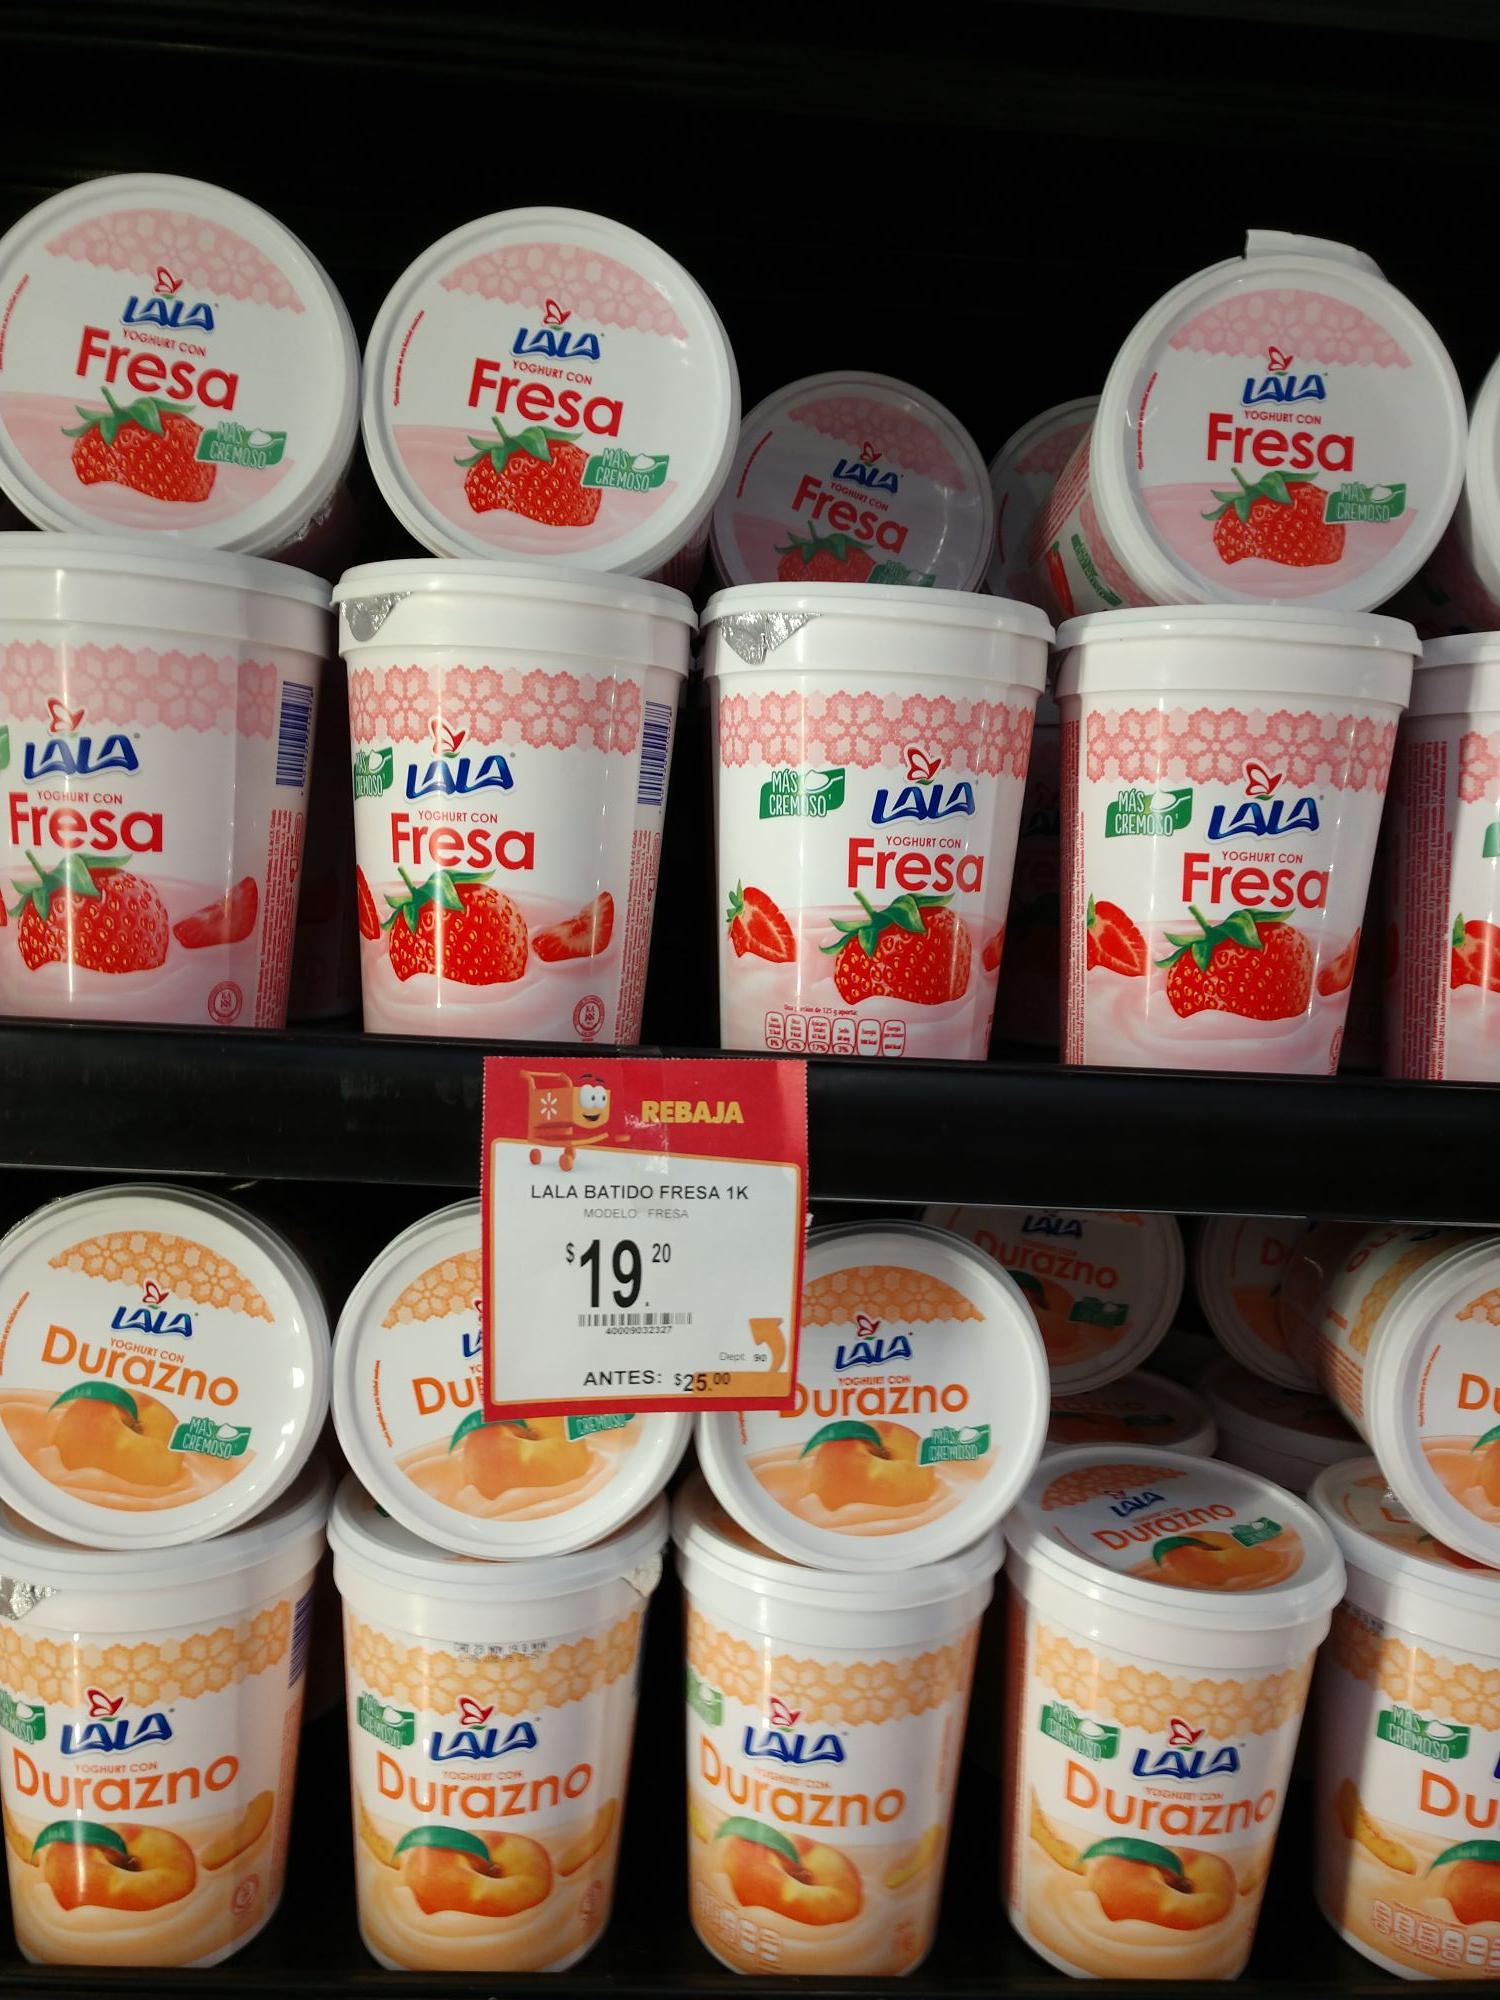 Walmart Xalapa: Yogurth Lala varios sabores